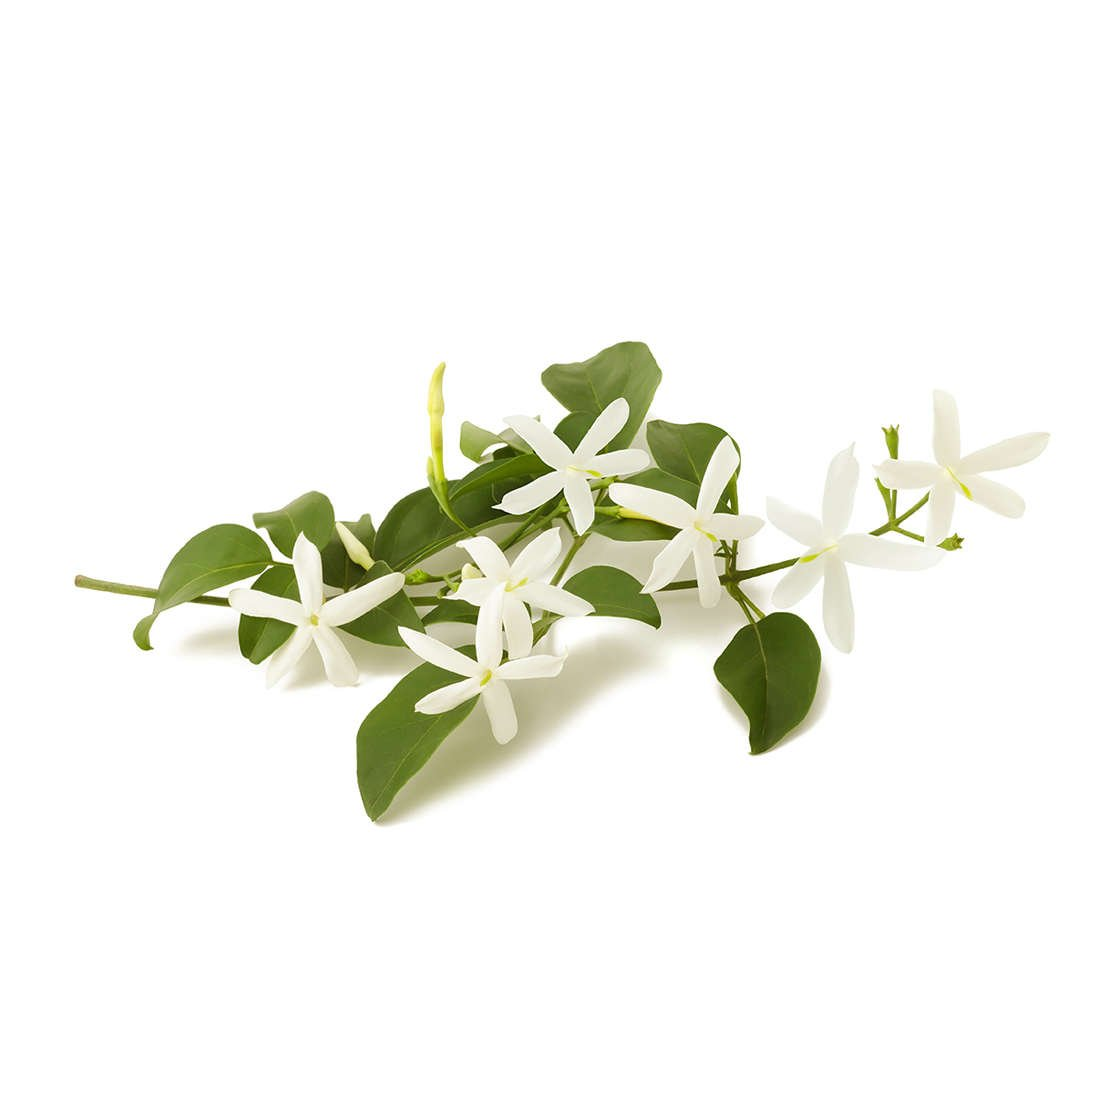 Jasmine essential oil is calming